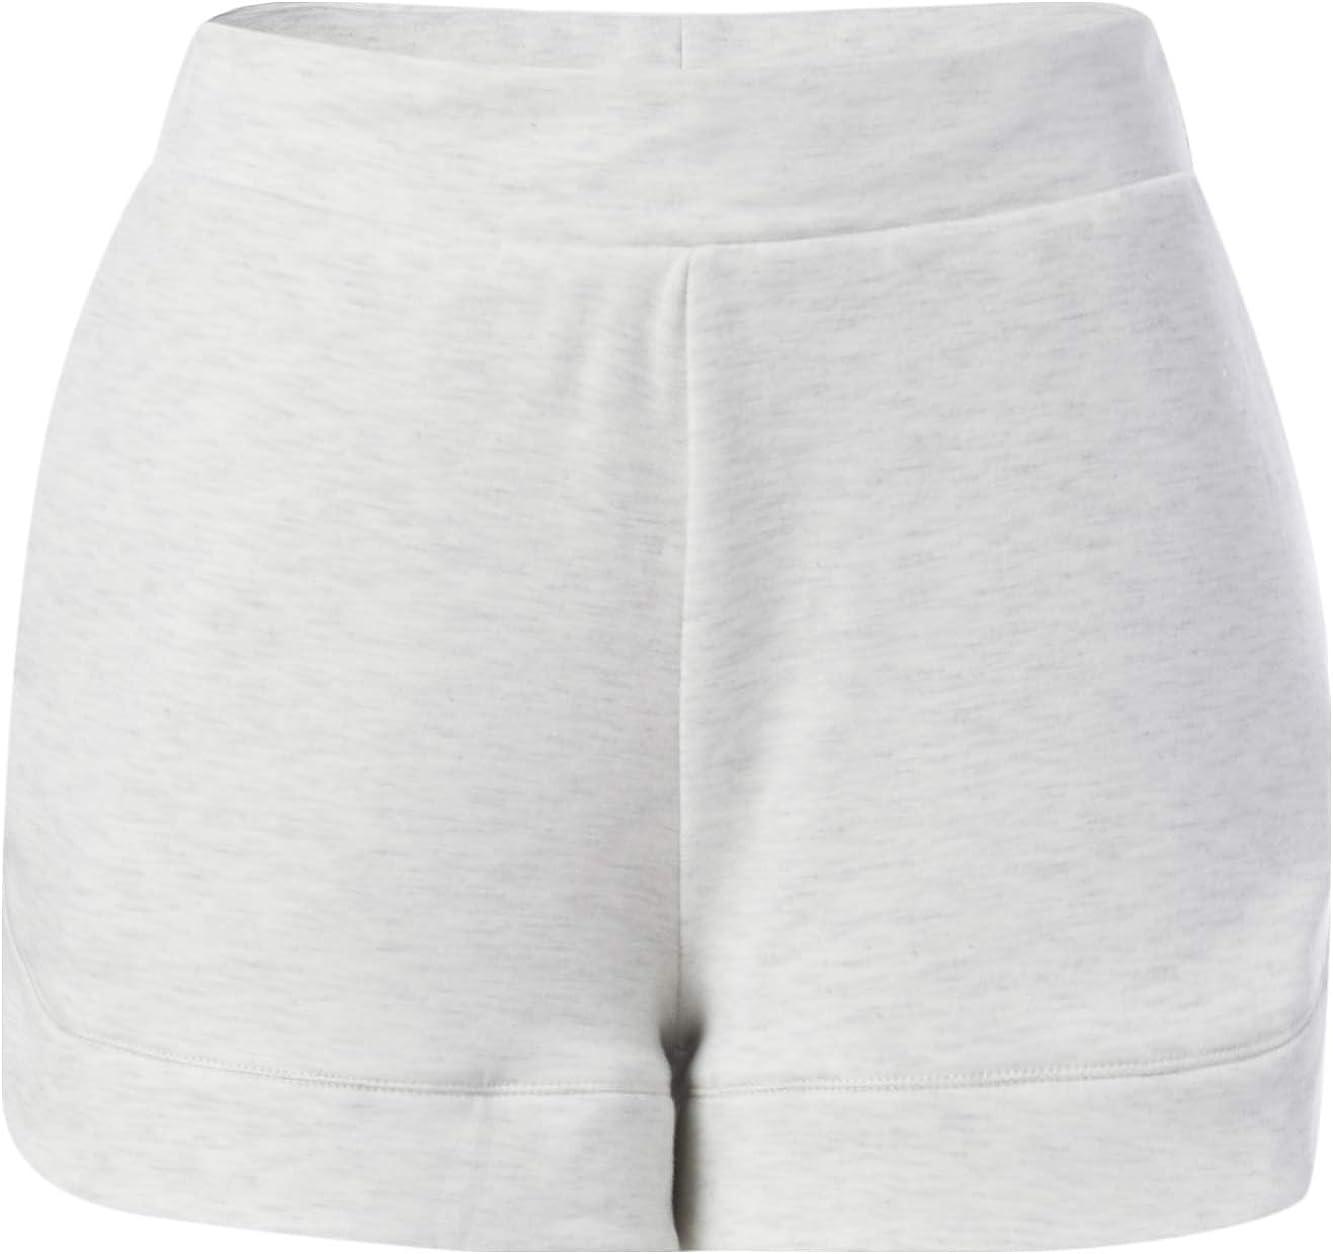 Danskin Damen Sustainable Legere Shorts